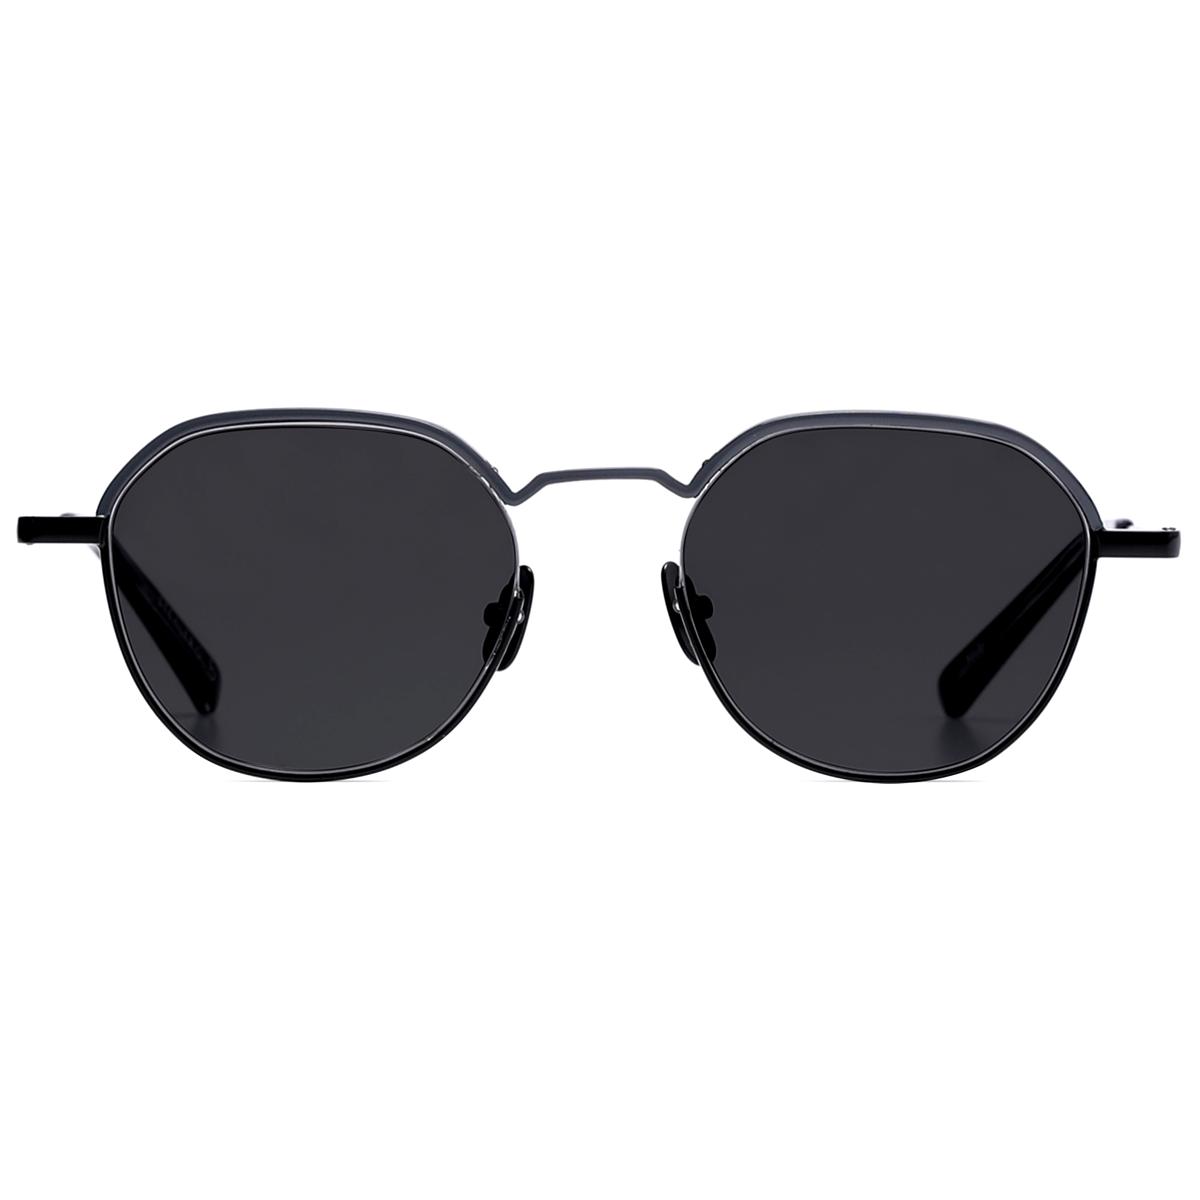 499de4ed8b7  Sold Out  FOG (SUN) BLACK EDITION272.5